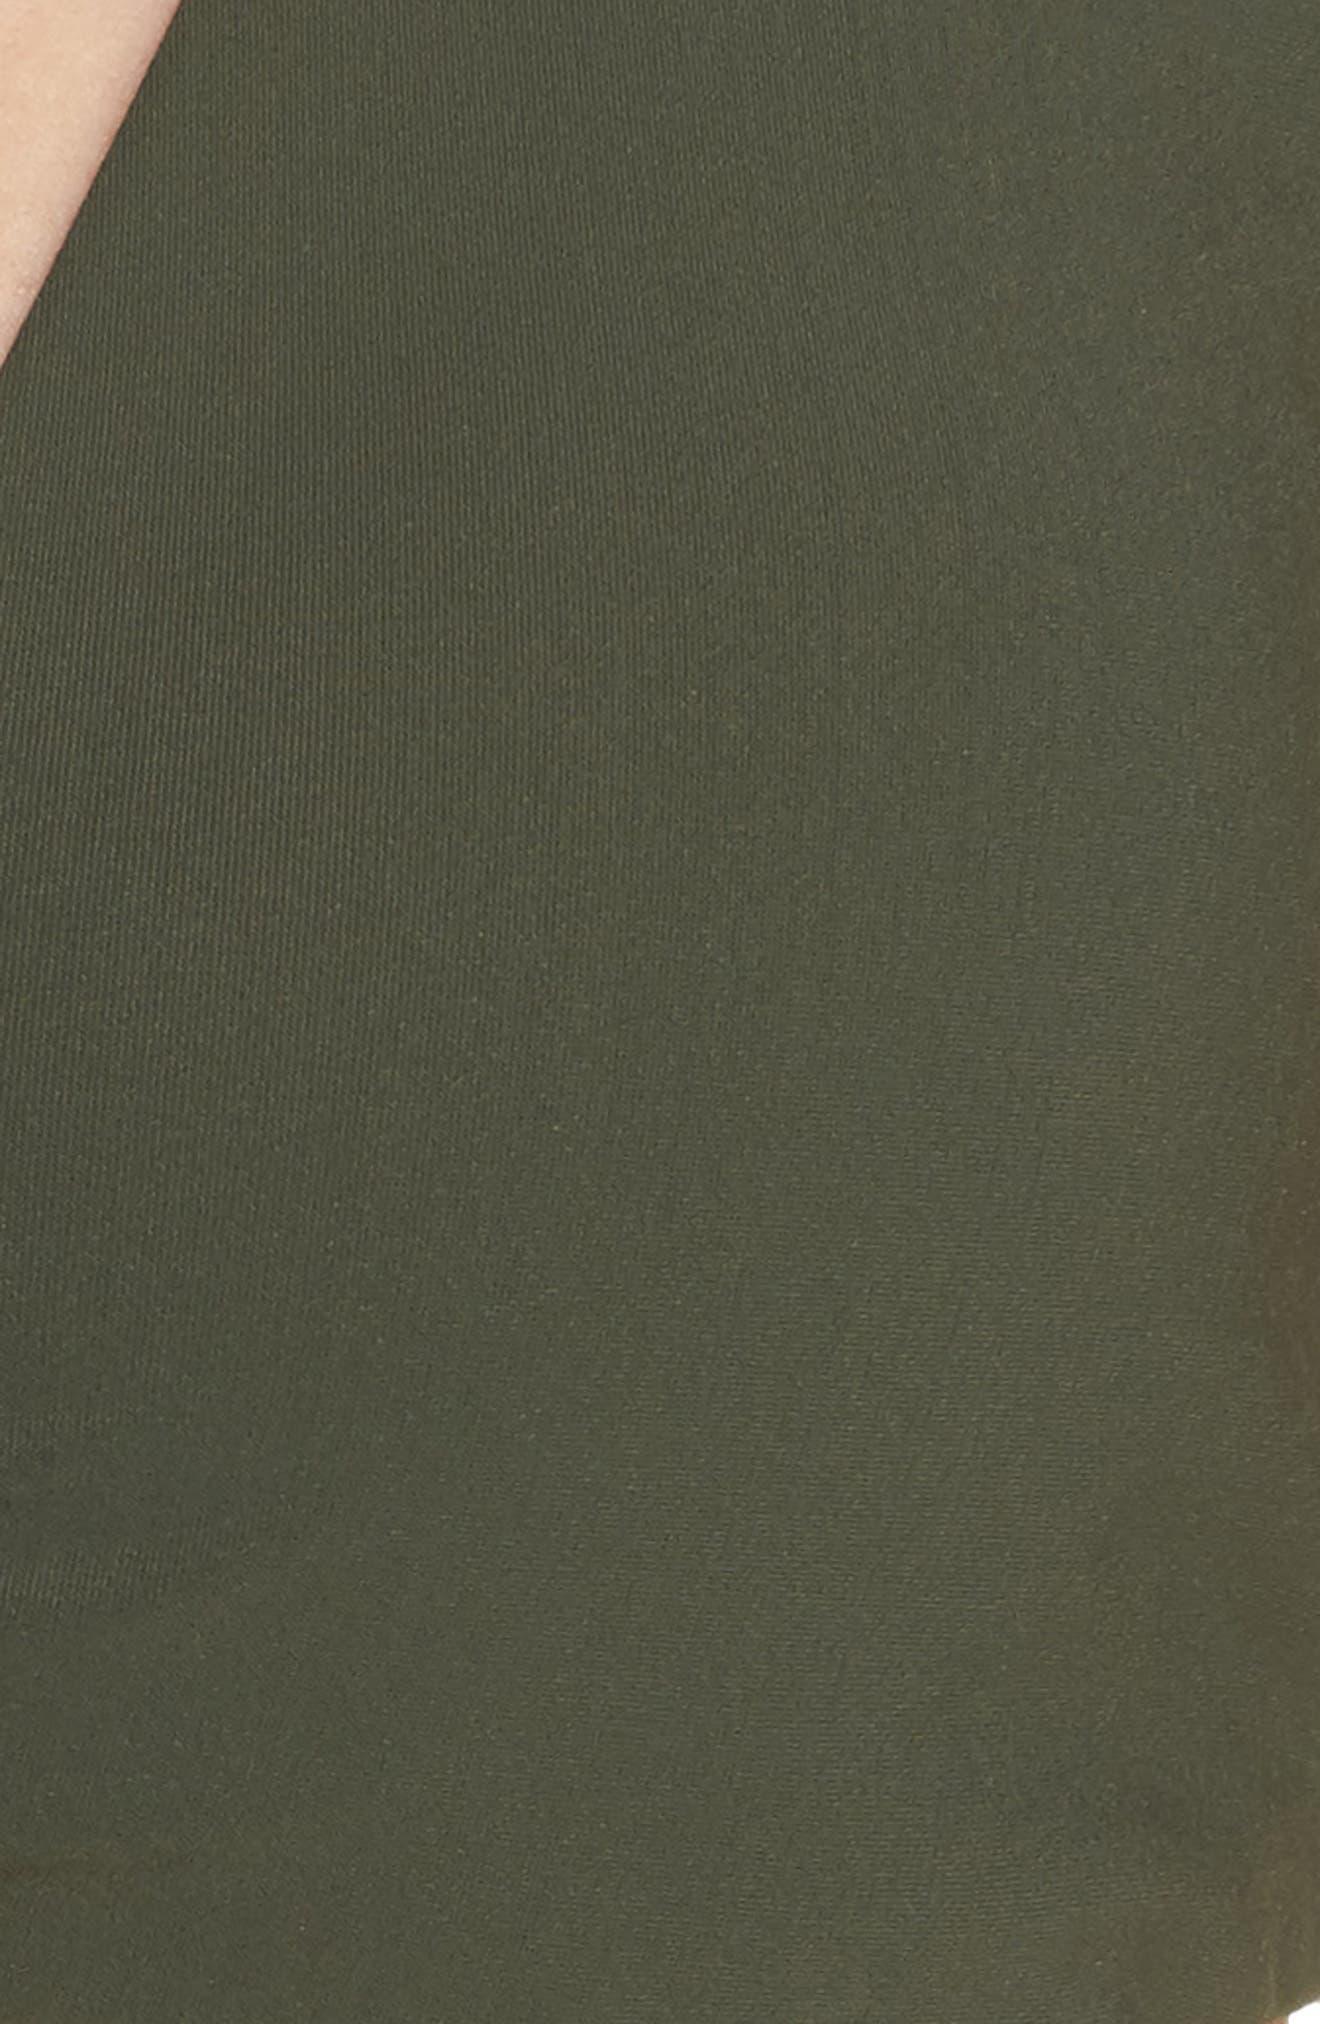 Biarritz Reversible Bikini Top,                             Alternate thumbnail 8, color,                             Green Olive/ Sweet Tangerine